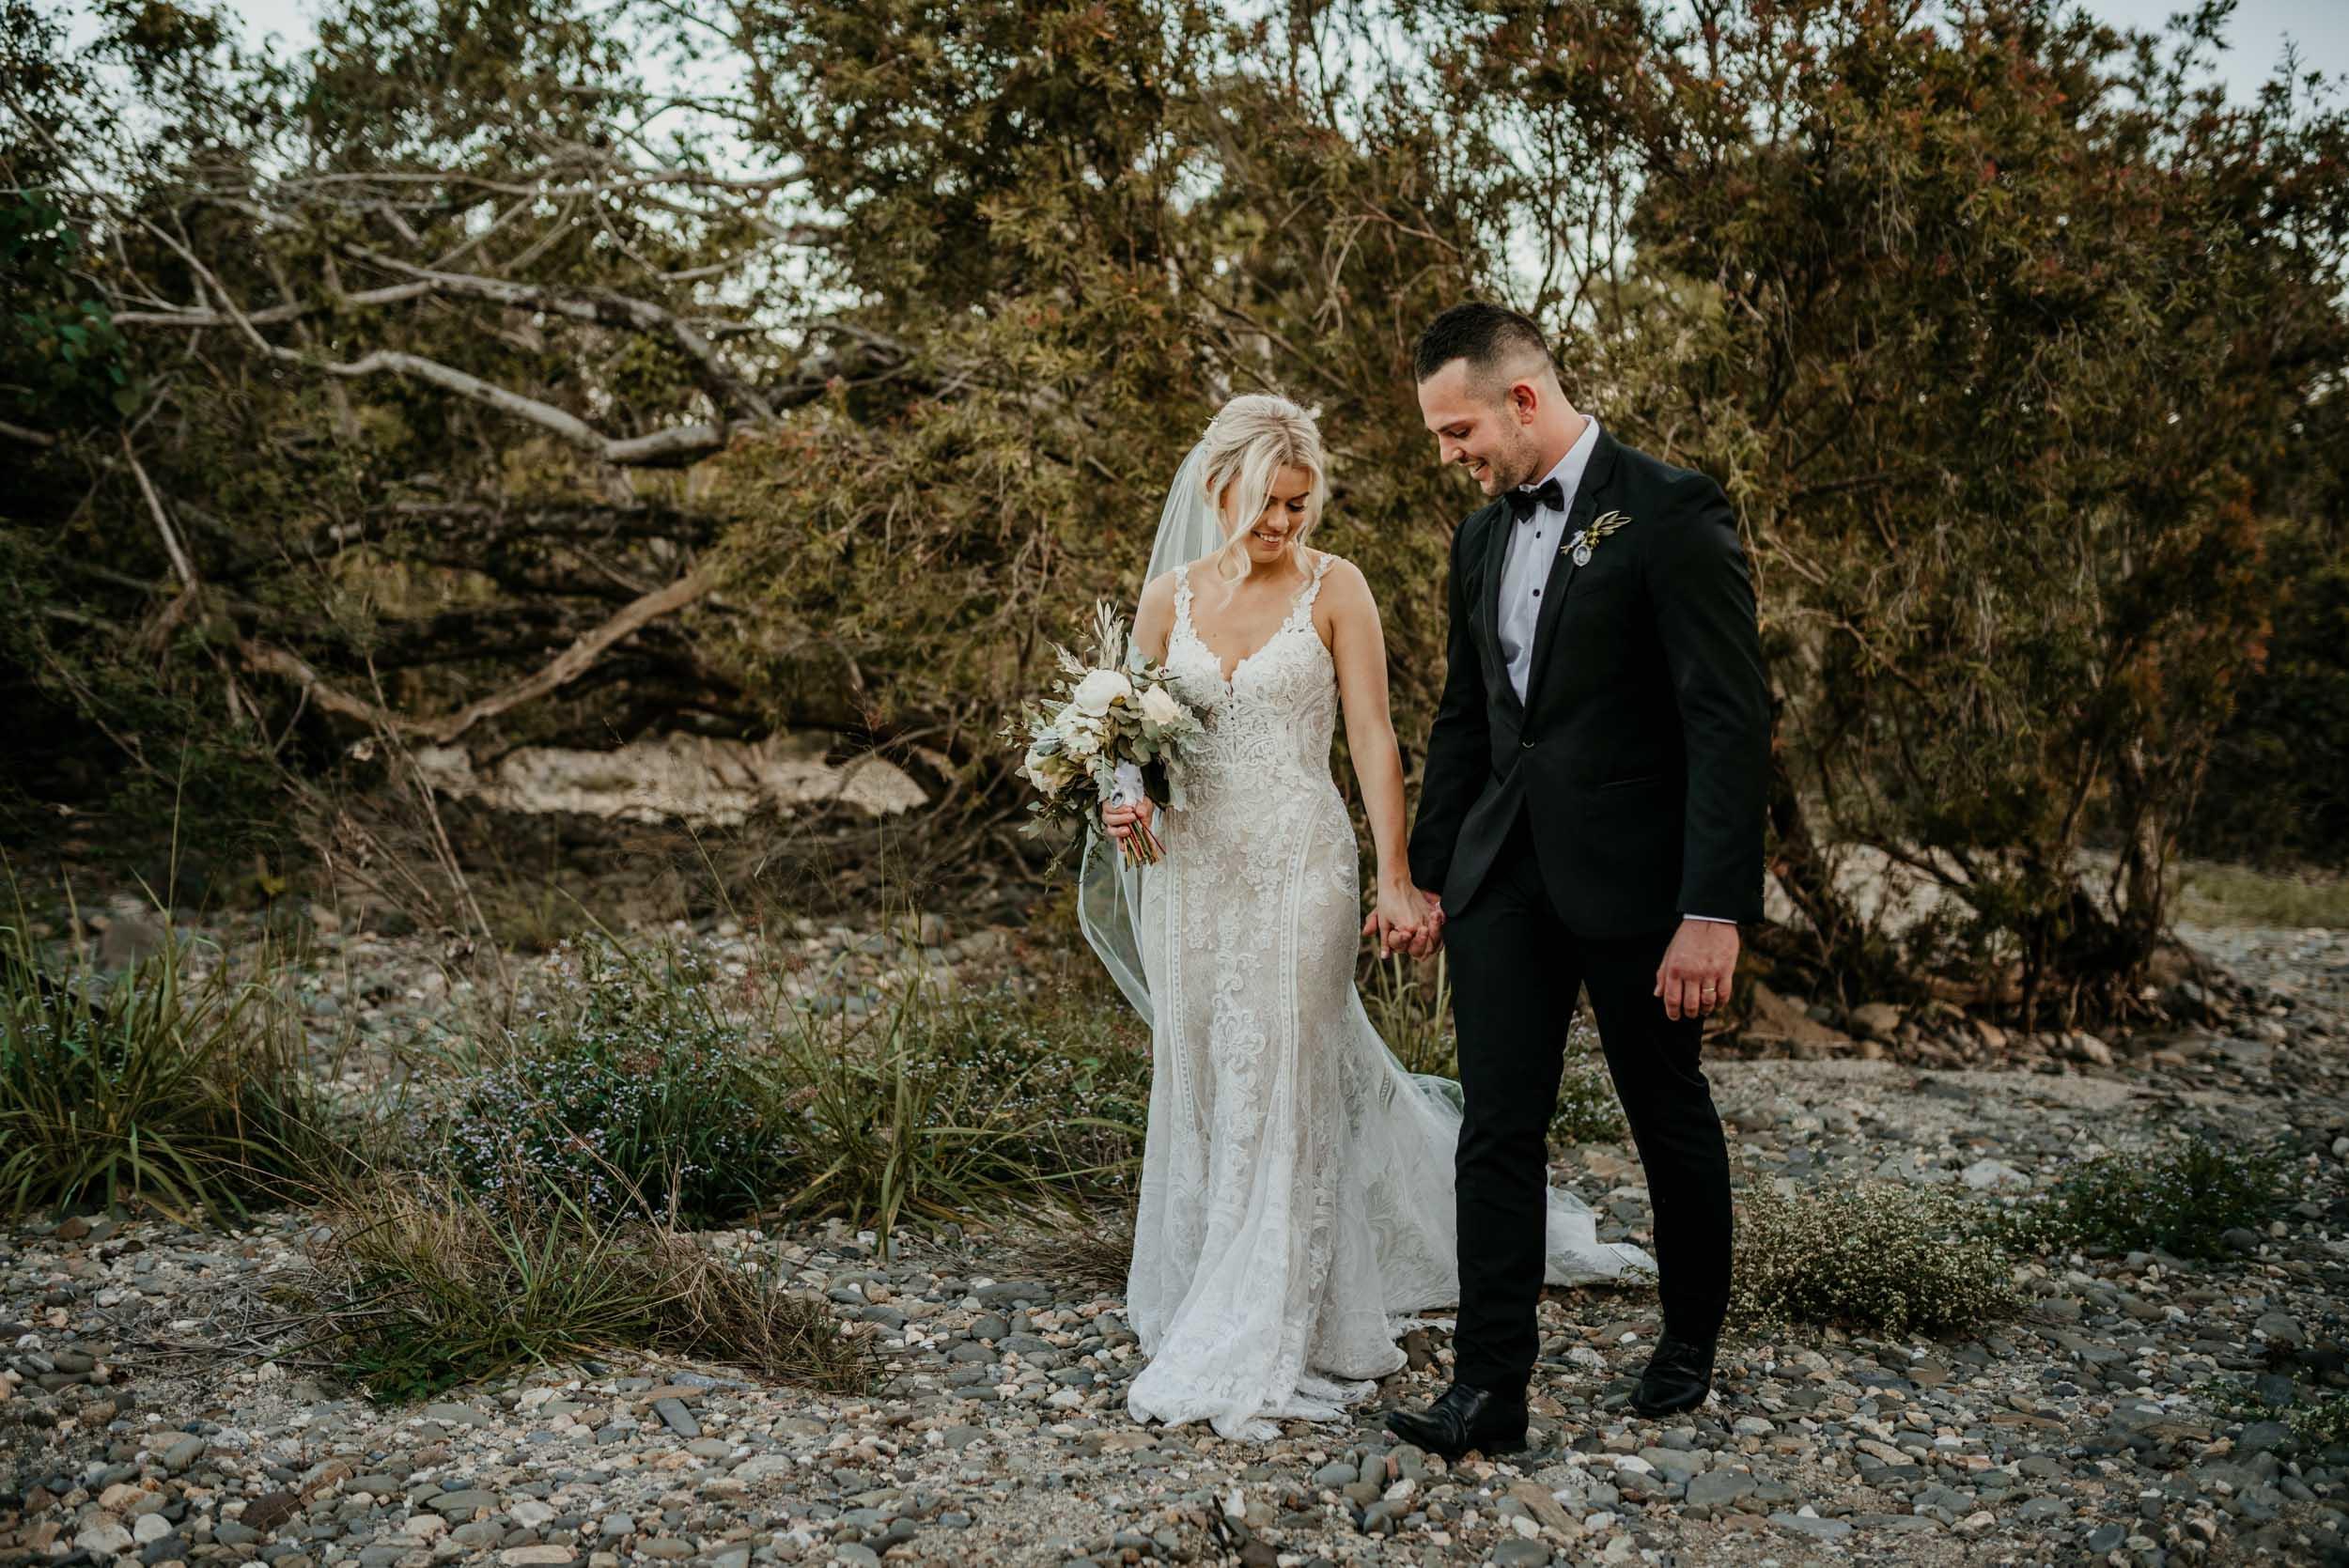 The Raw Photographer - Cairns Wedding Photographer - Laloli - Cairns Garden Wedding - Bride Dress - Destination Wed - Outdoor Reception - Queensland Ceremony-56.jpg